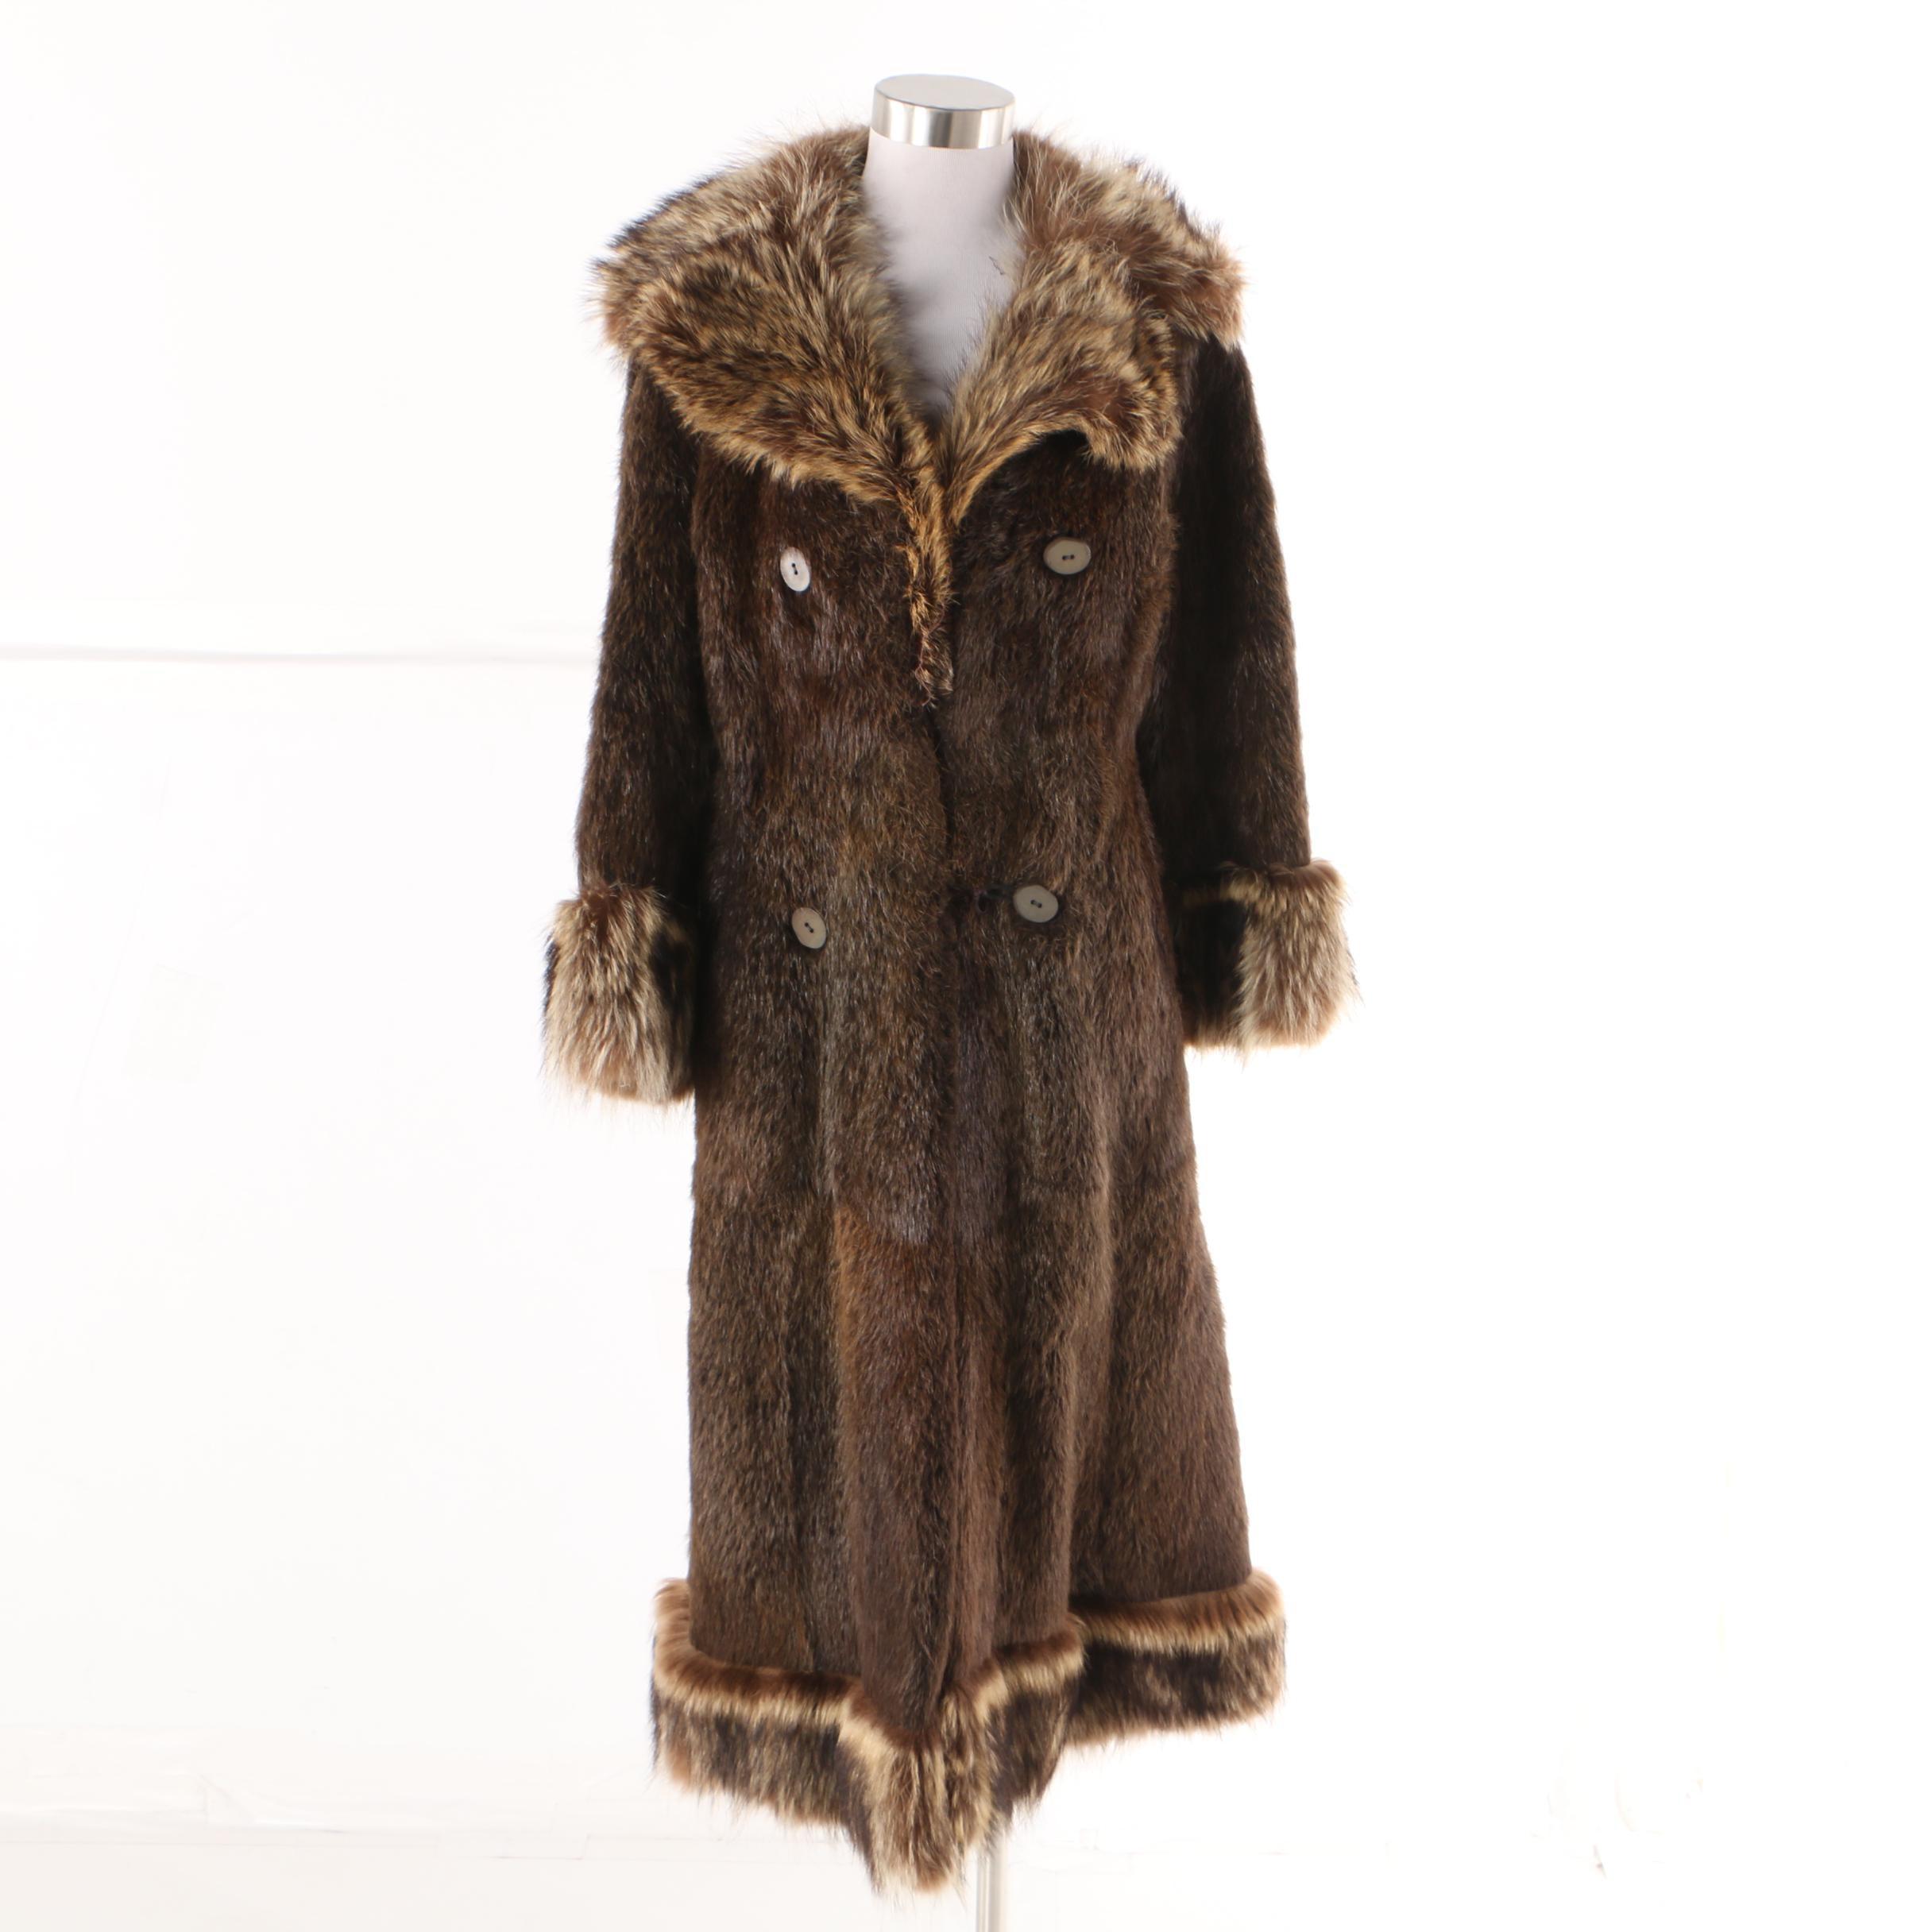 Women's Vintage Nutria Fur Double-Breasted Coat with Raccoon Fur Trim